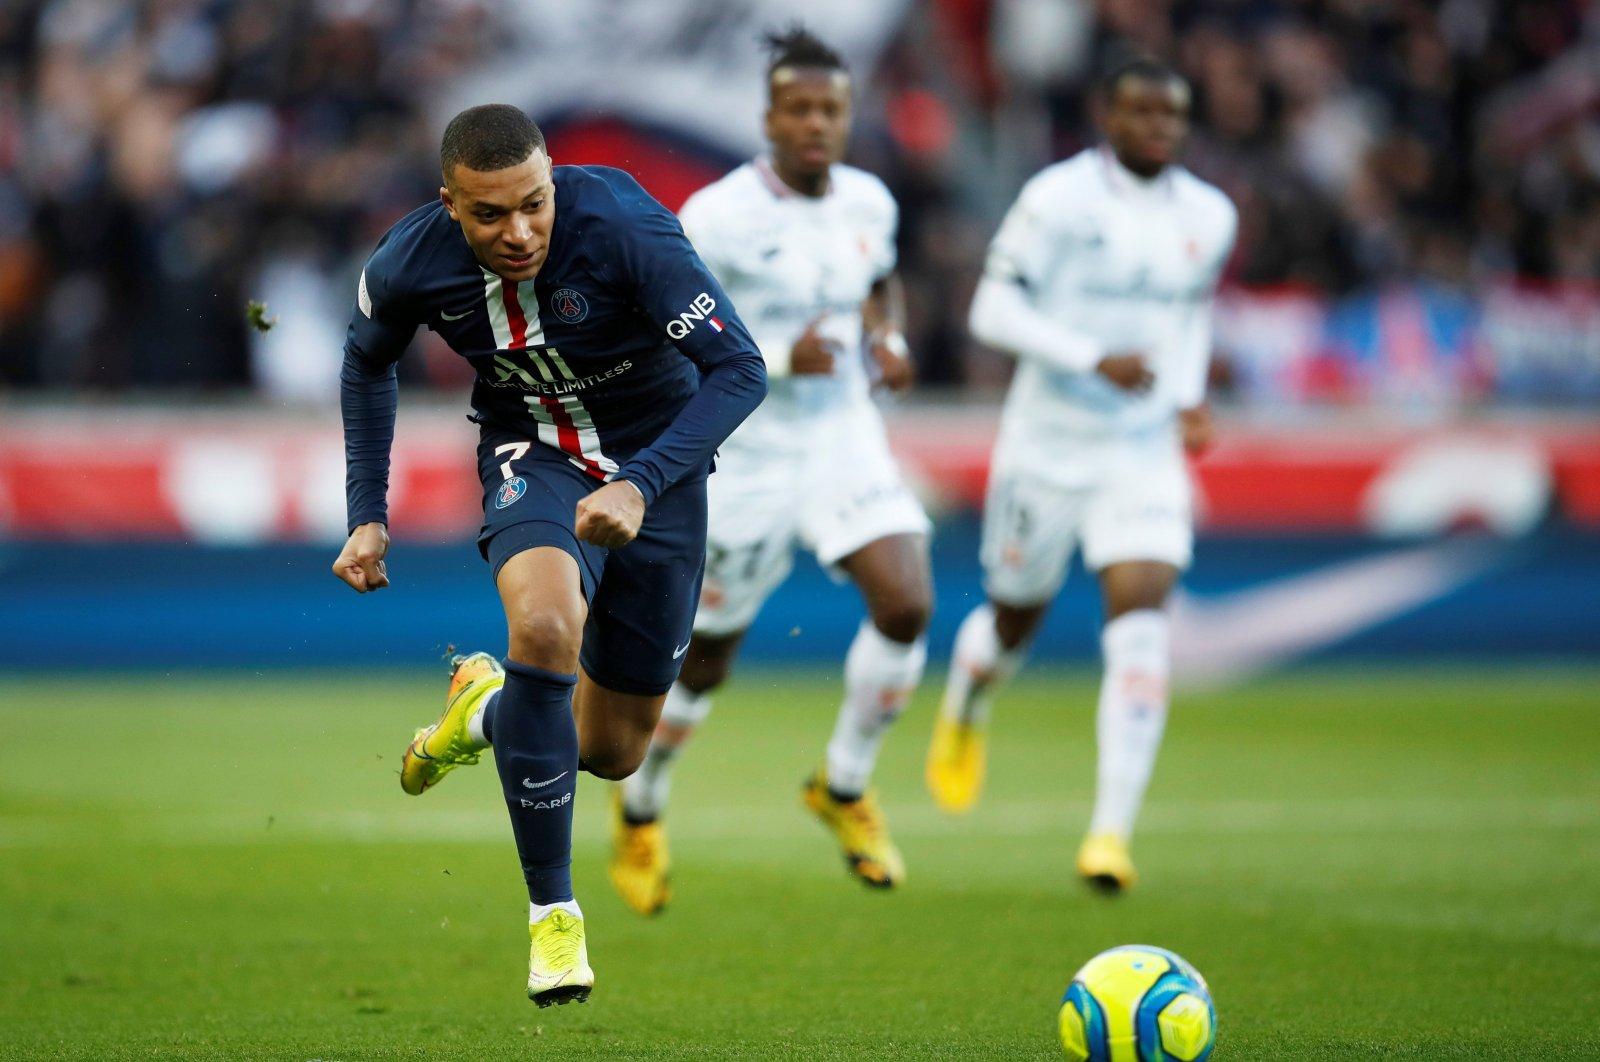 Kylian Mbappe in action against Dijon, in Paris, France, Feb. 29, 2020. (REUTERS Photo)